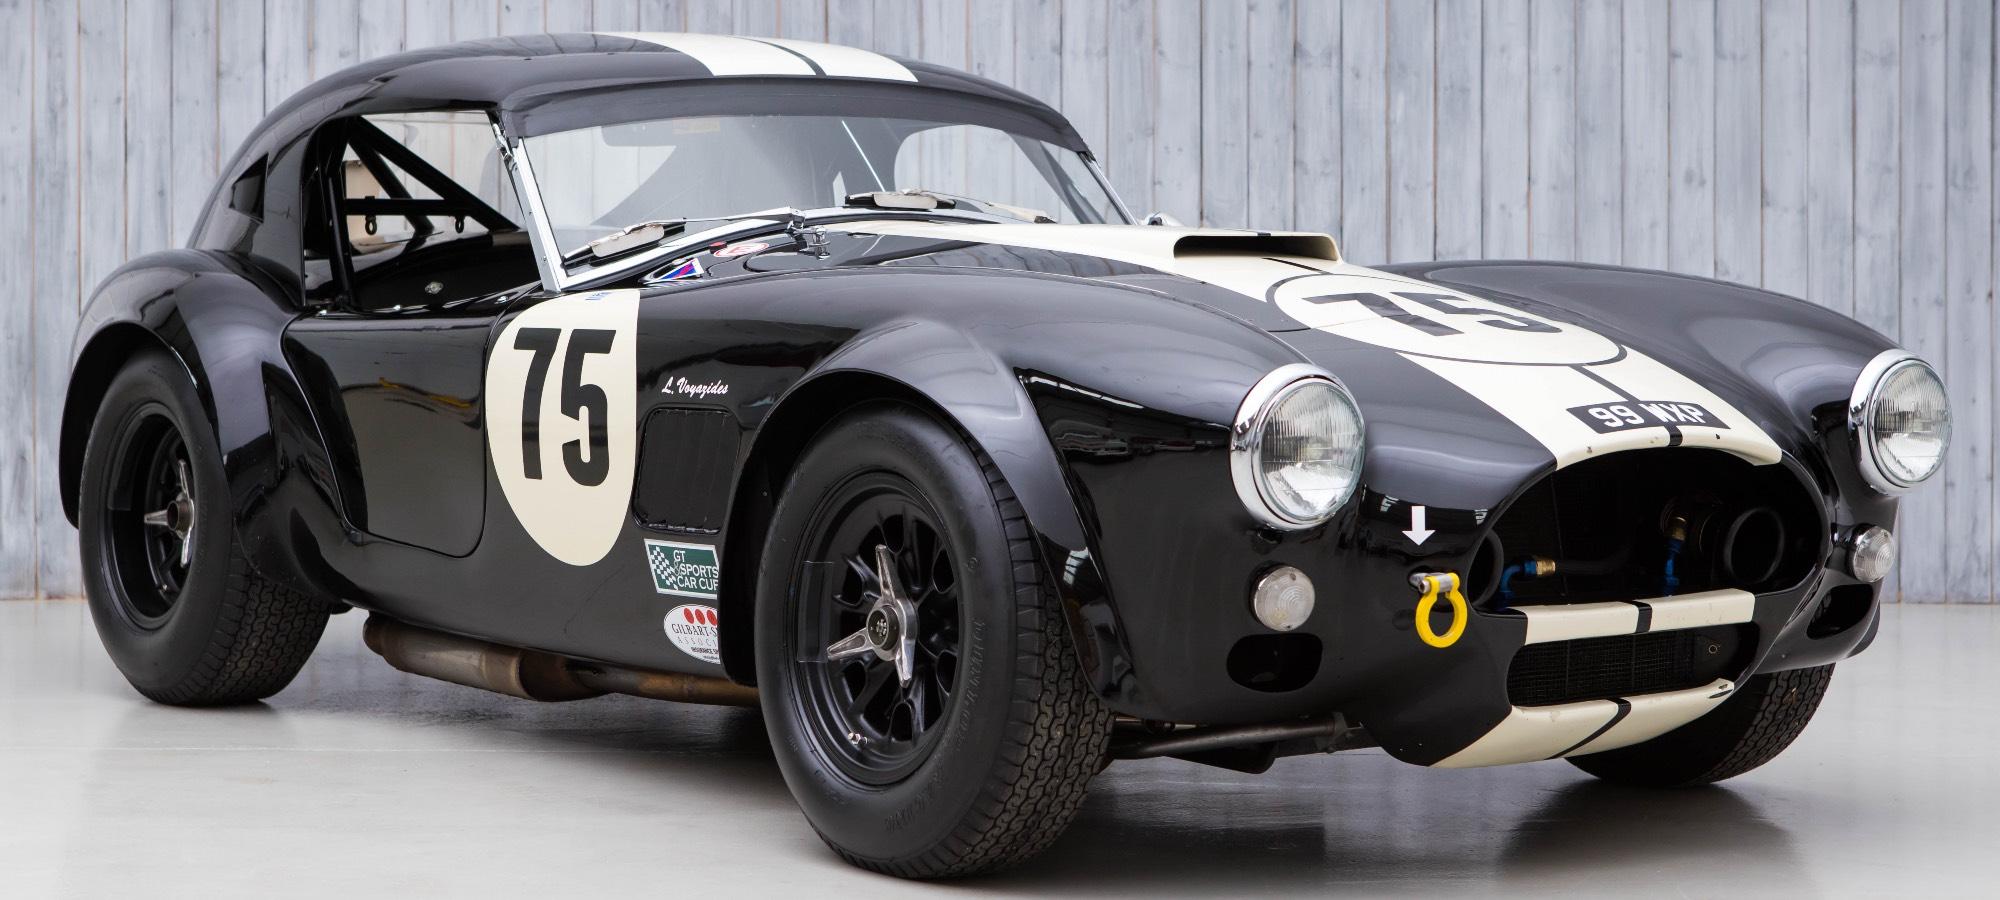 The Multiple Historic Championship Winning 1964 Shelby Cobra 289